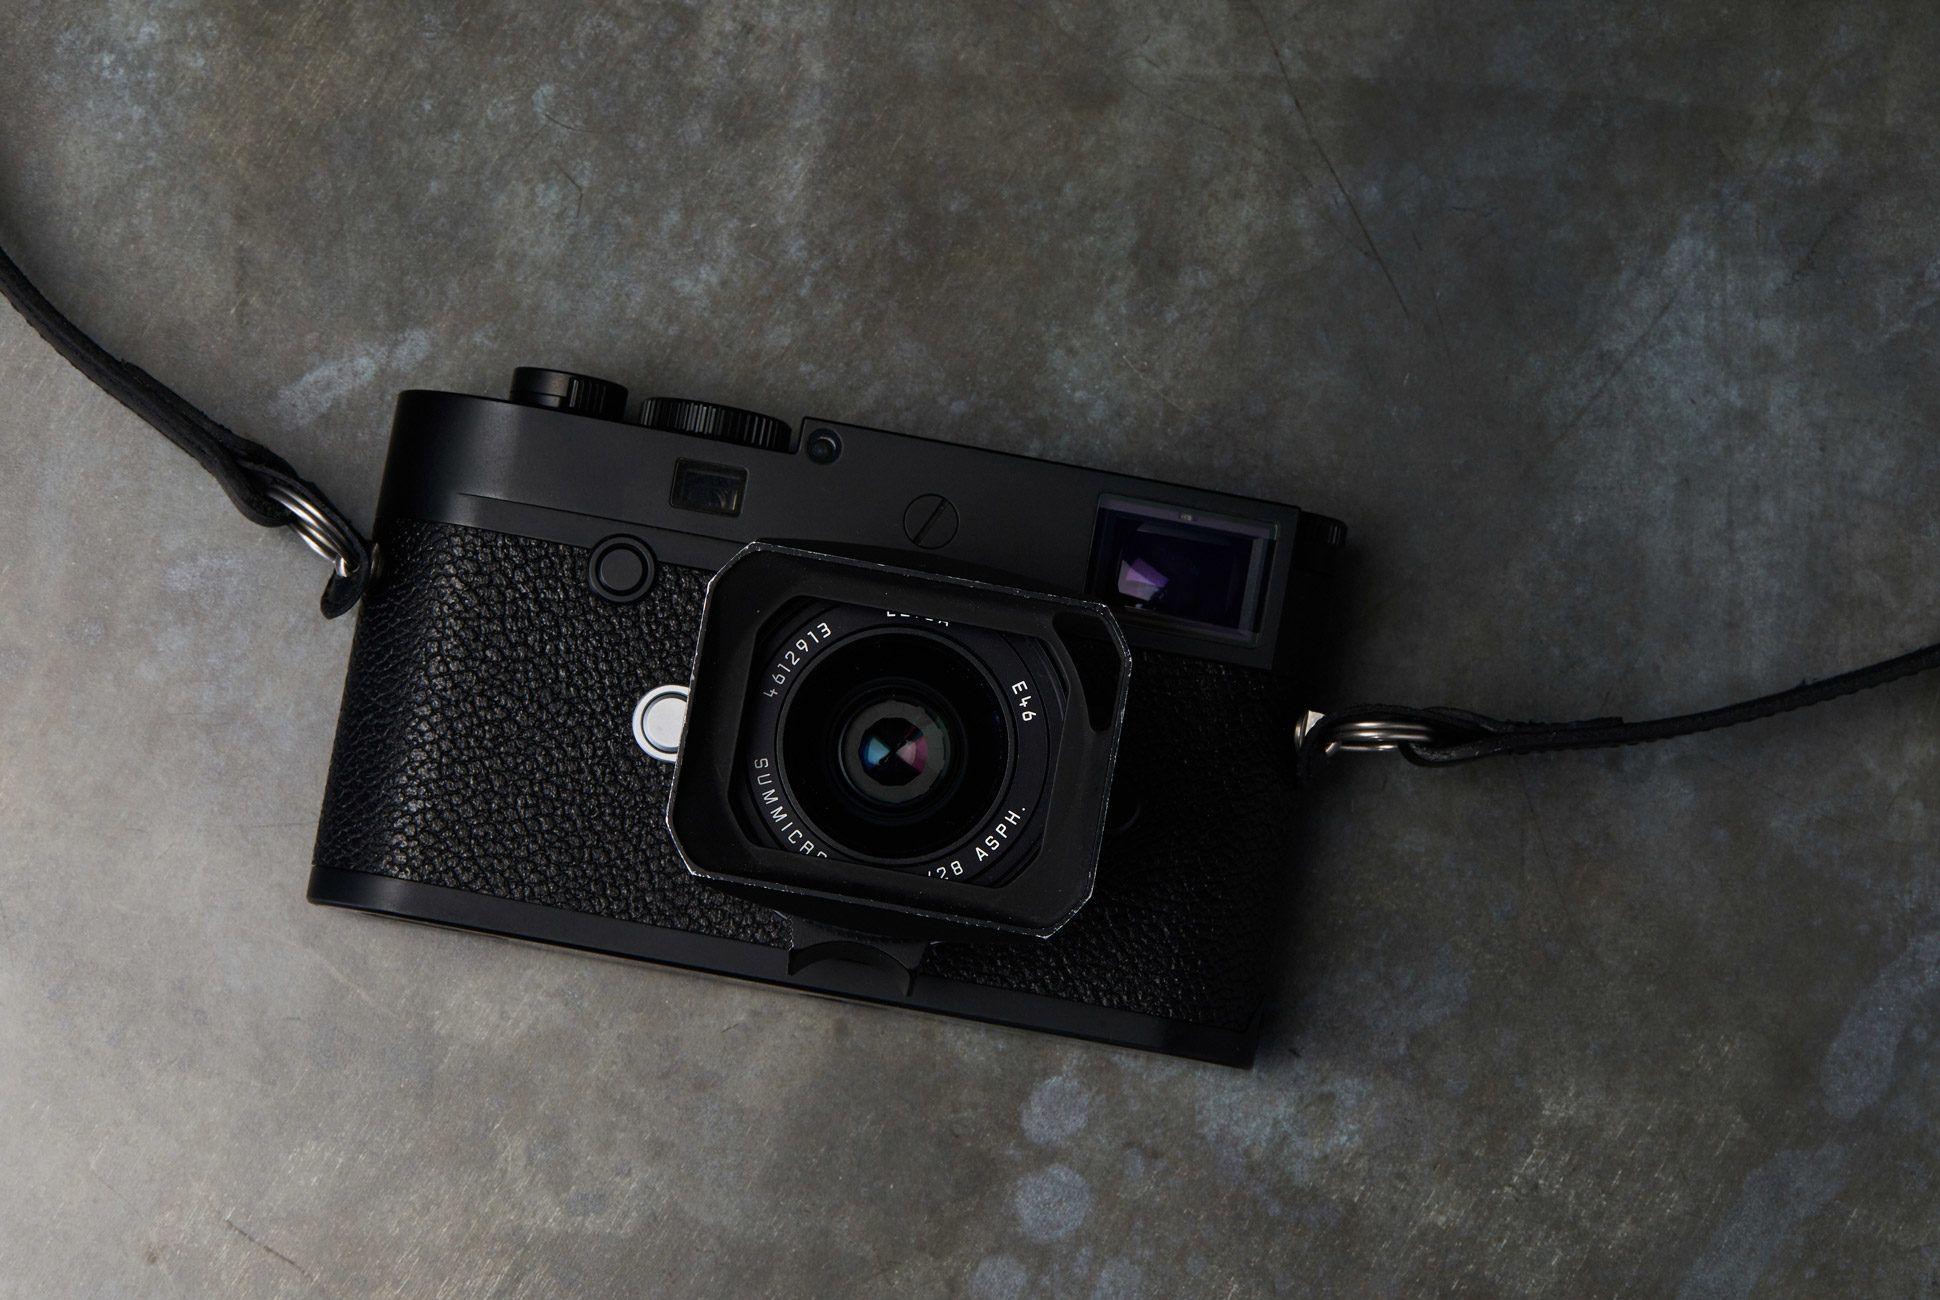 Leica-M10P-Gear-Patrol-Slide-1